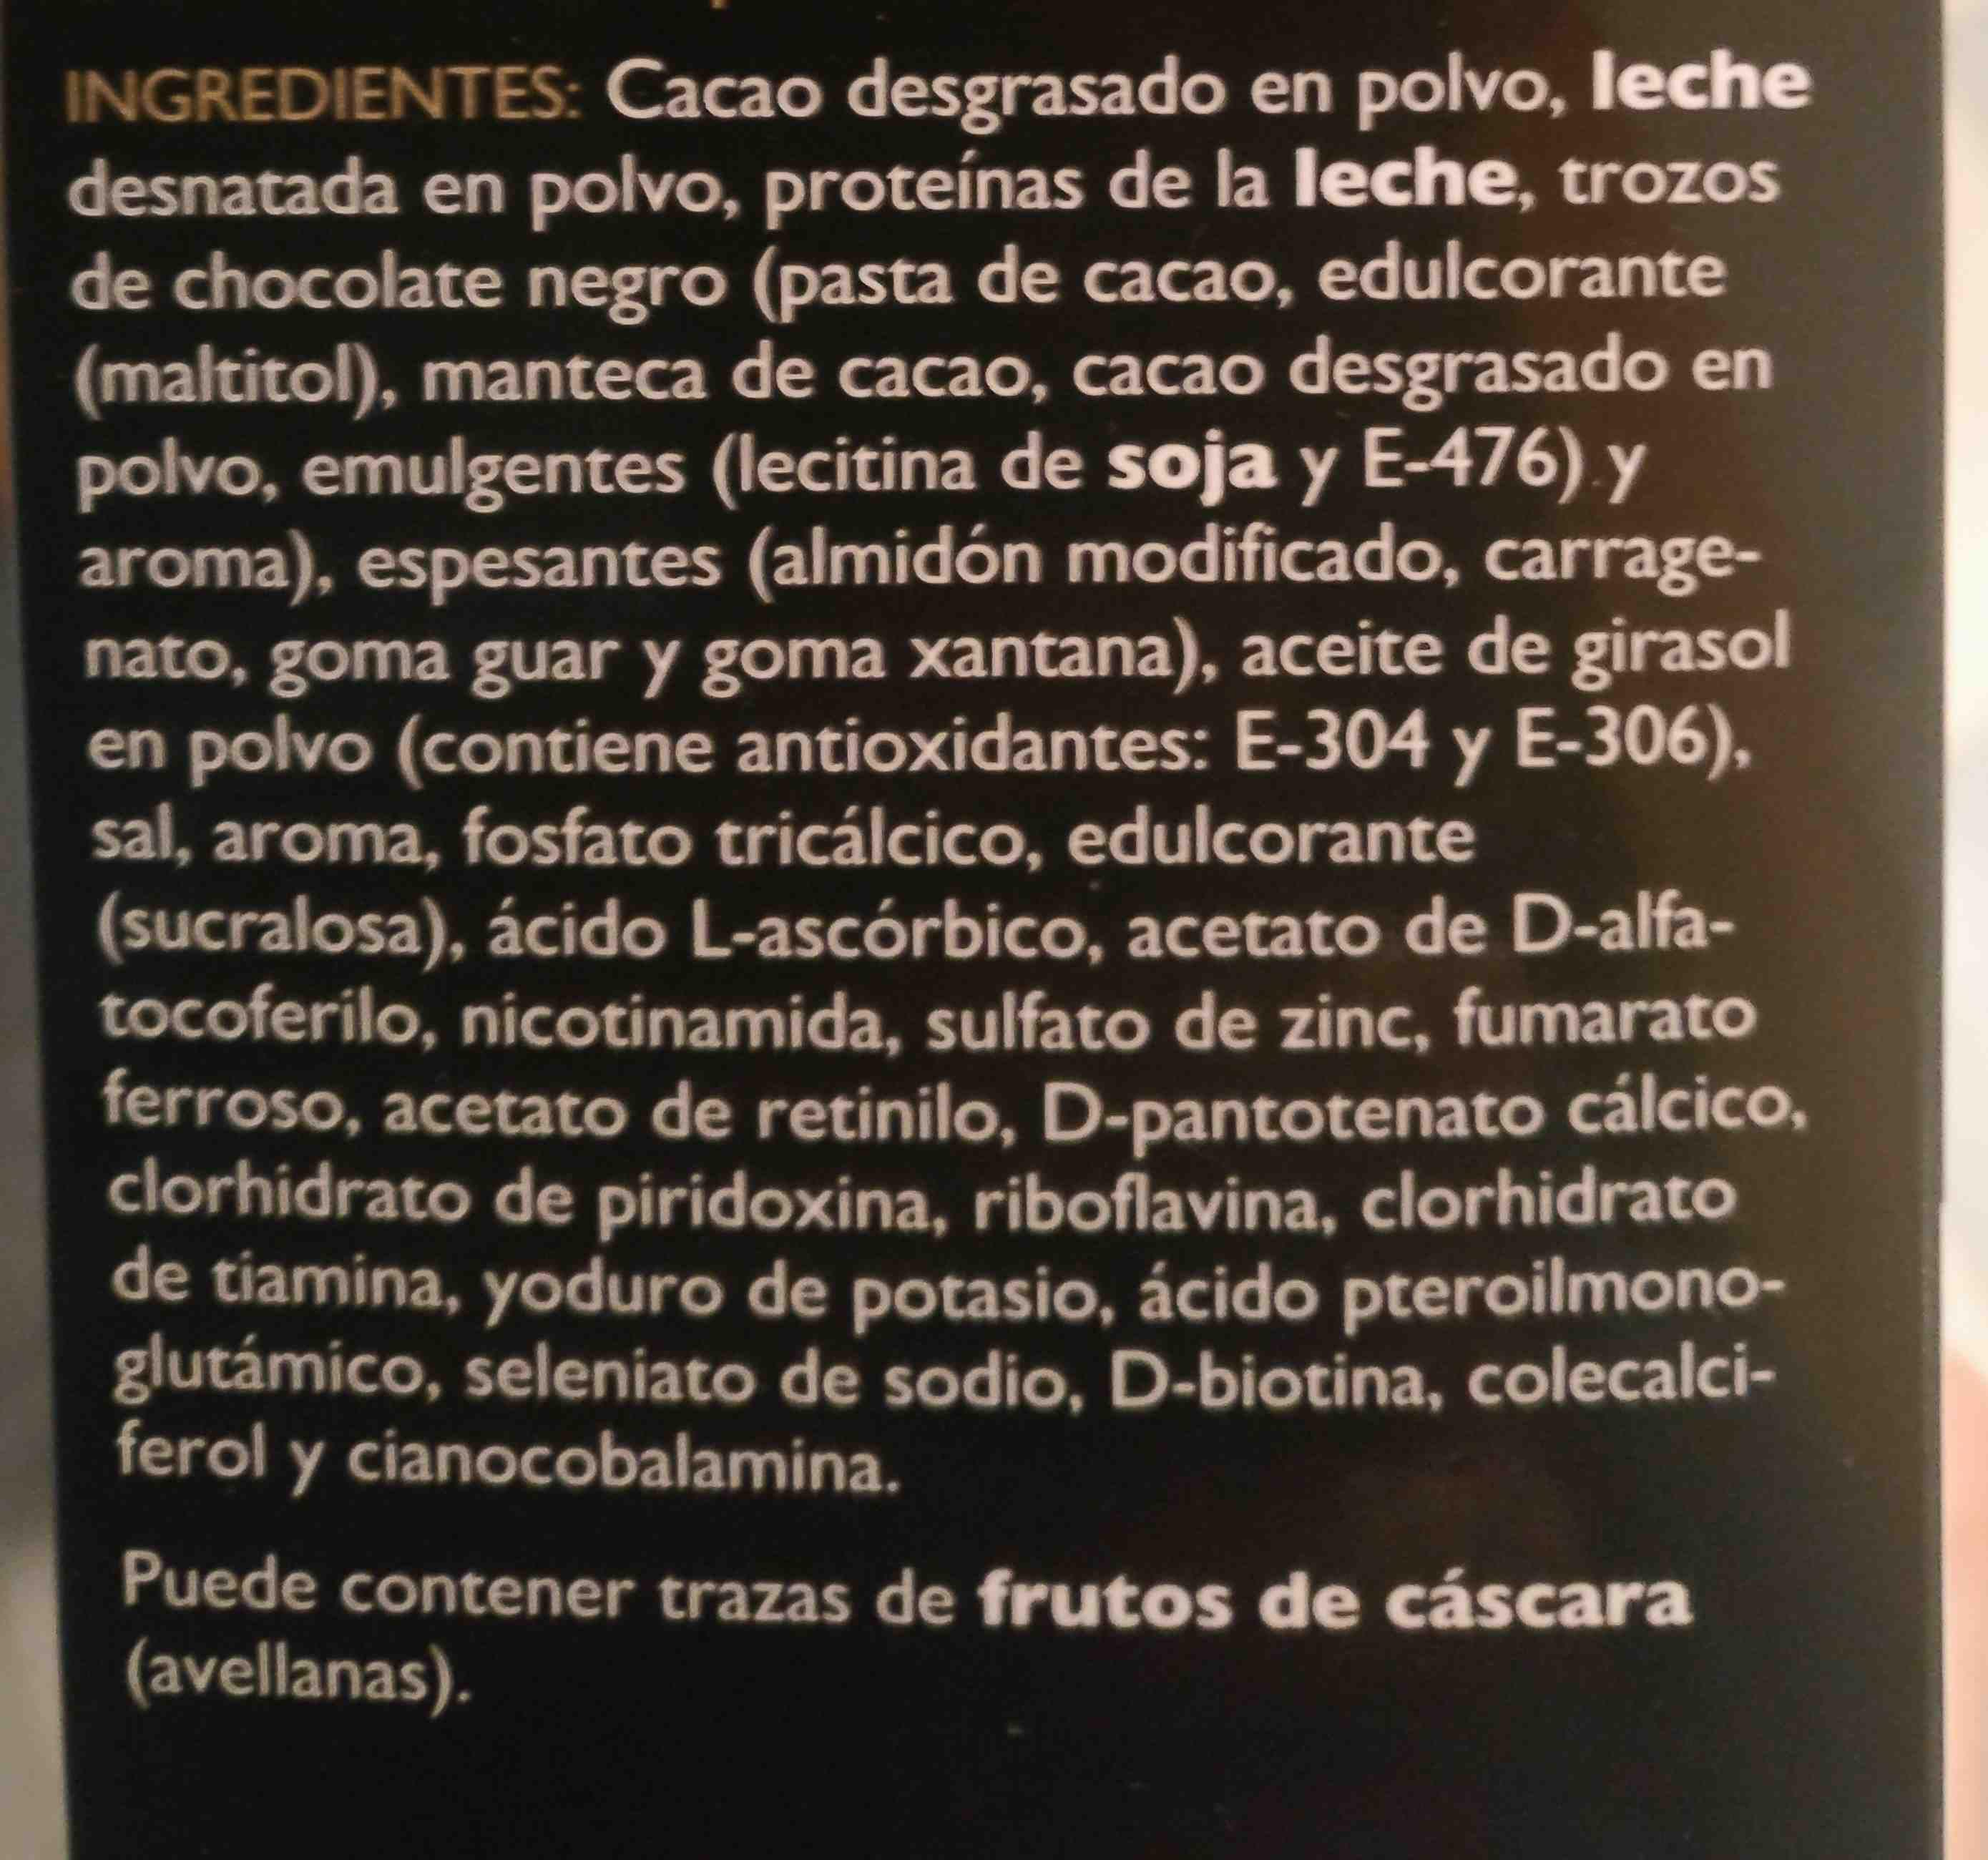 Natilla sabor chocolate sustitutiva - Ingredients - en